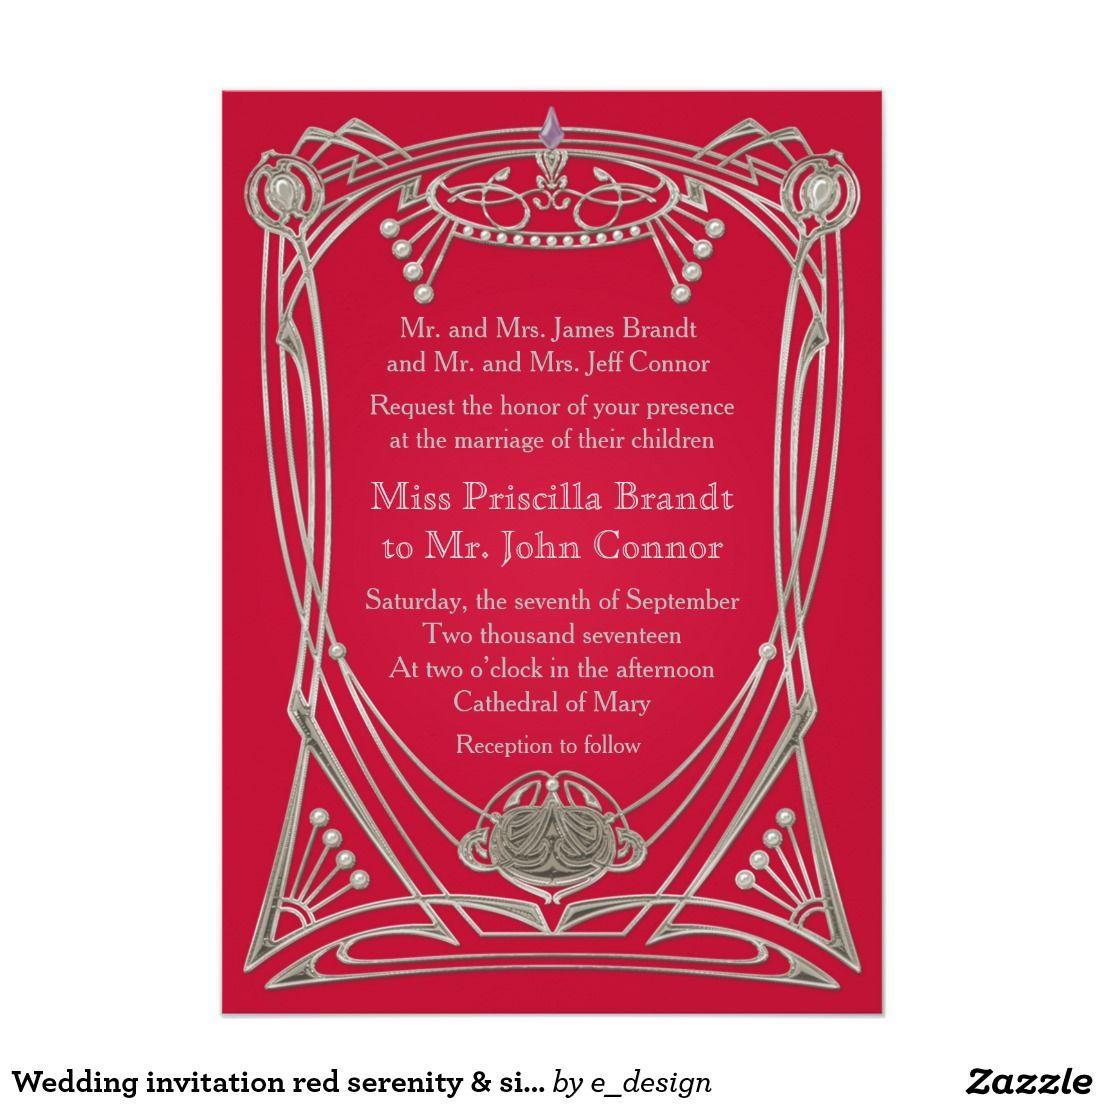 Wedding invitation red serenity & silver | Silver Wedding ...